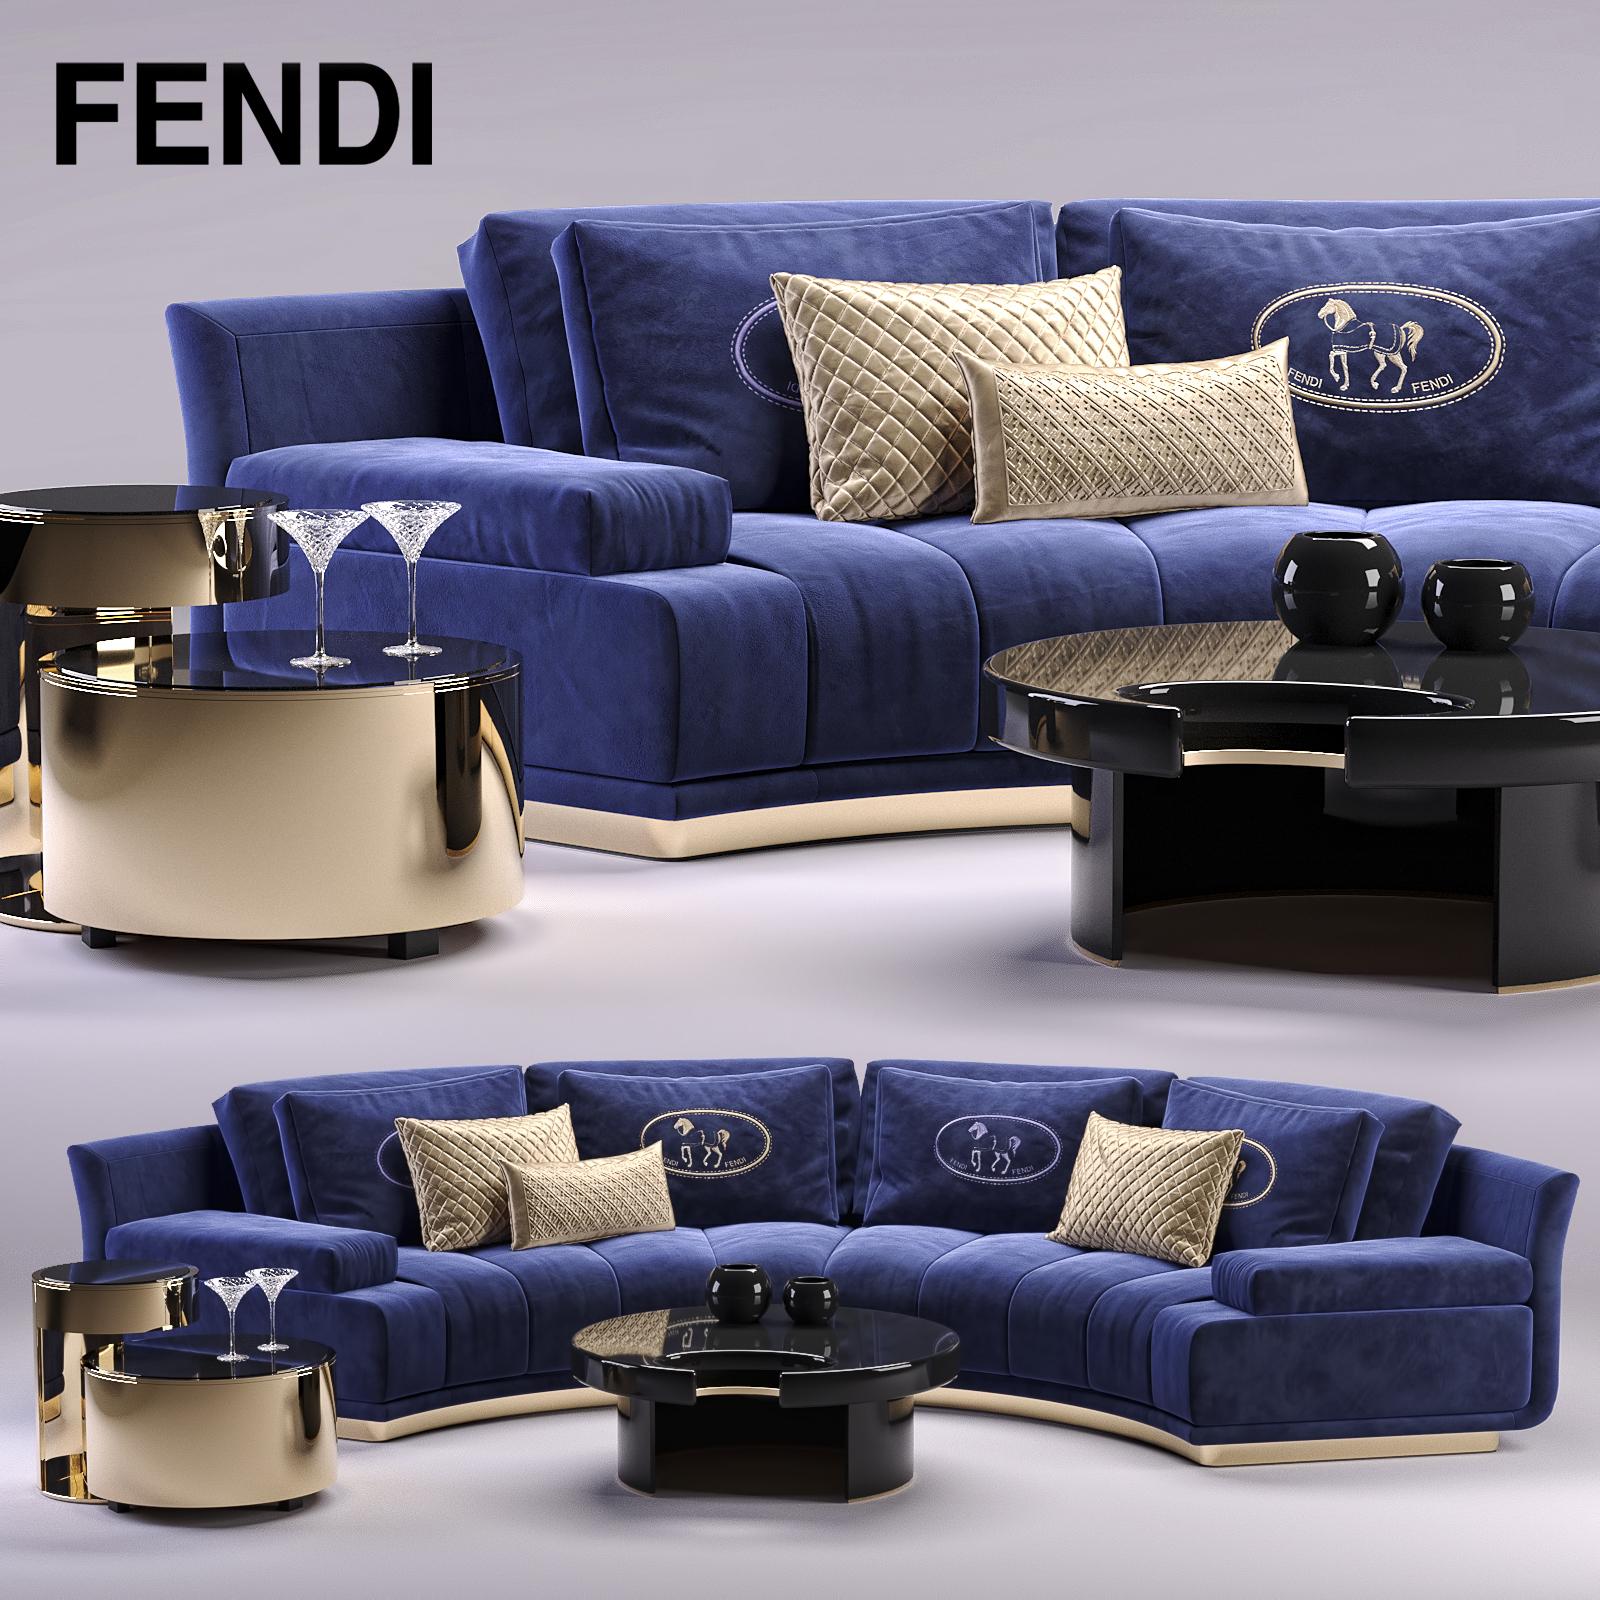 Surprising Fendi Artu Round Sectional Sofa Alphanode Cool Chair Designs And Ideas Alphanodeonline